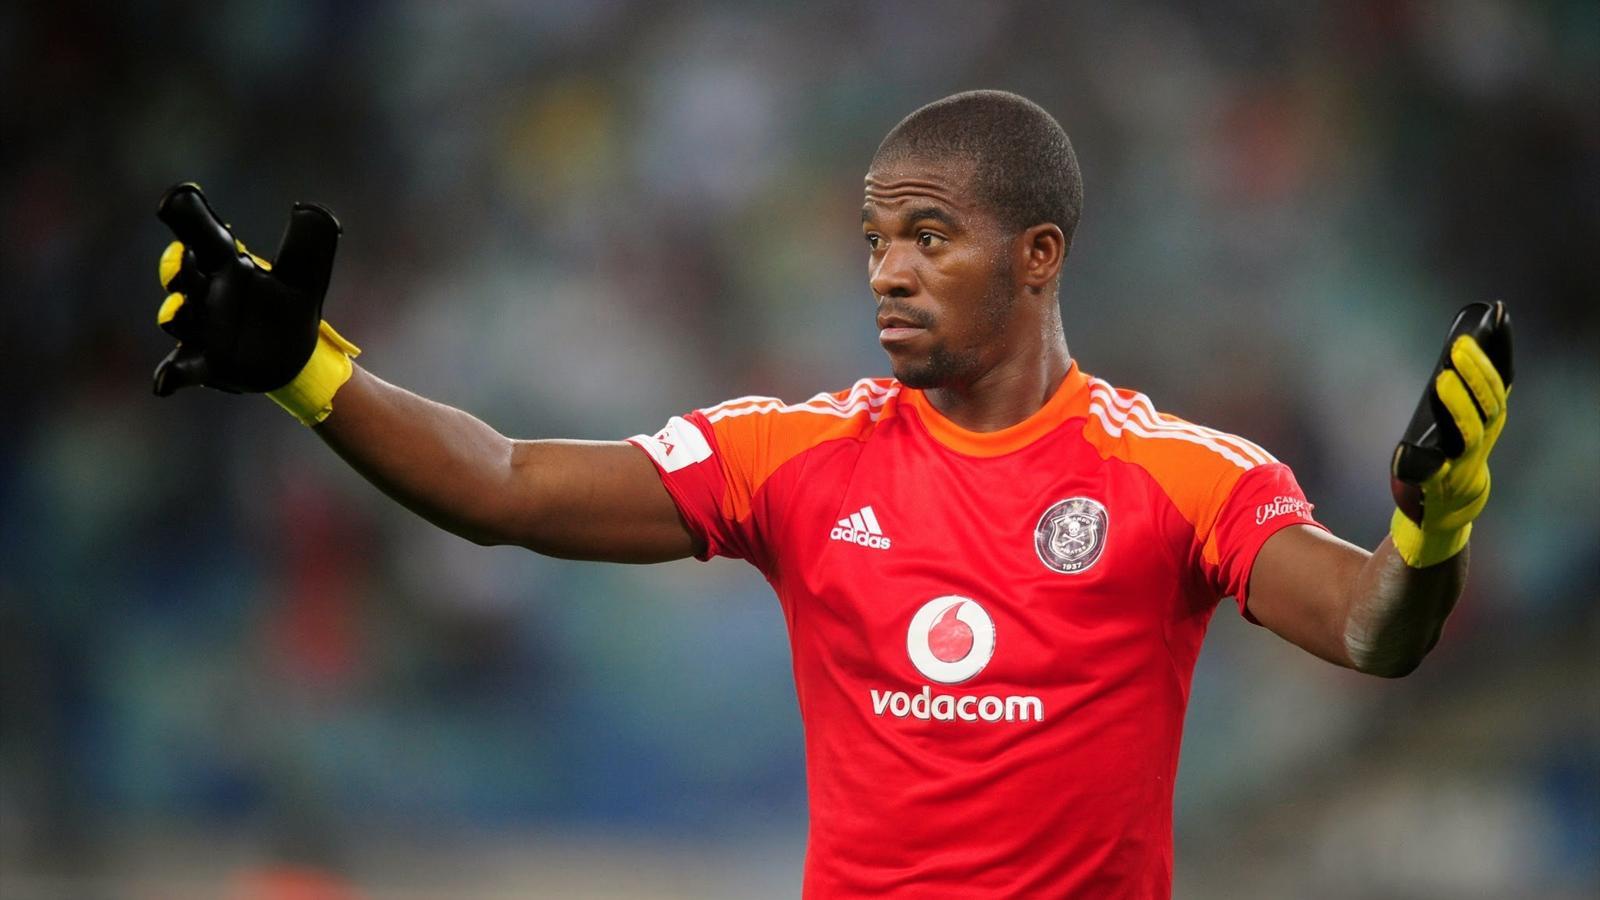 South Africa's Senzo Meyiwa shot dead, say police - African Football 2013 - Football - Eurosport